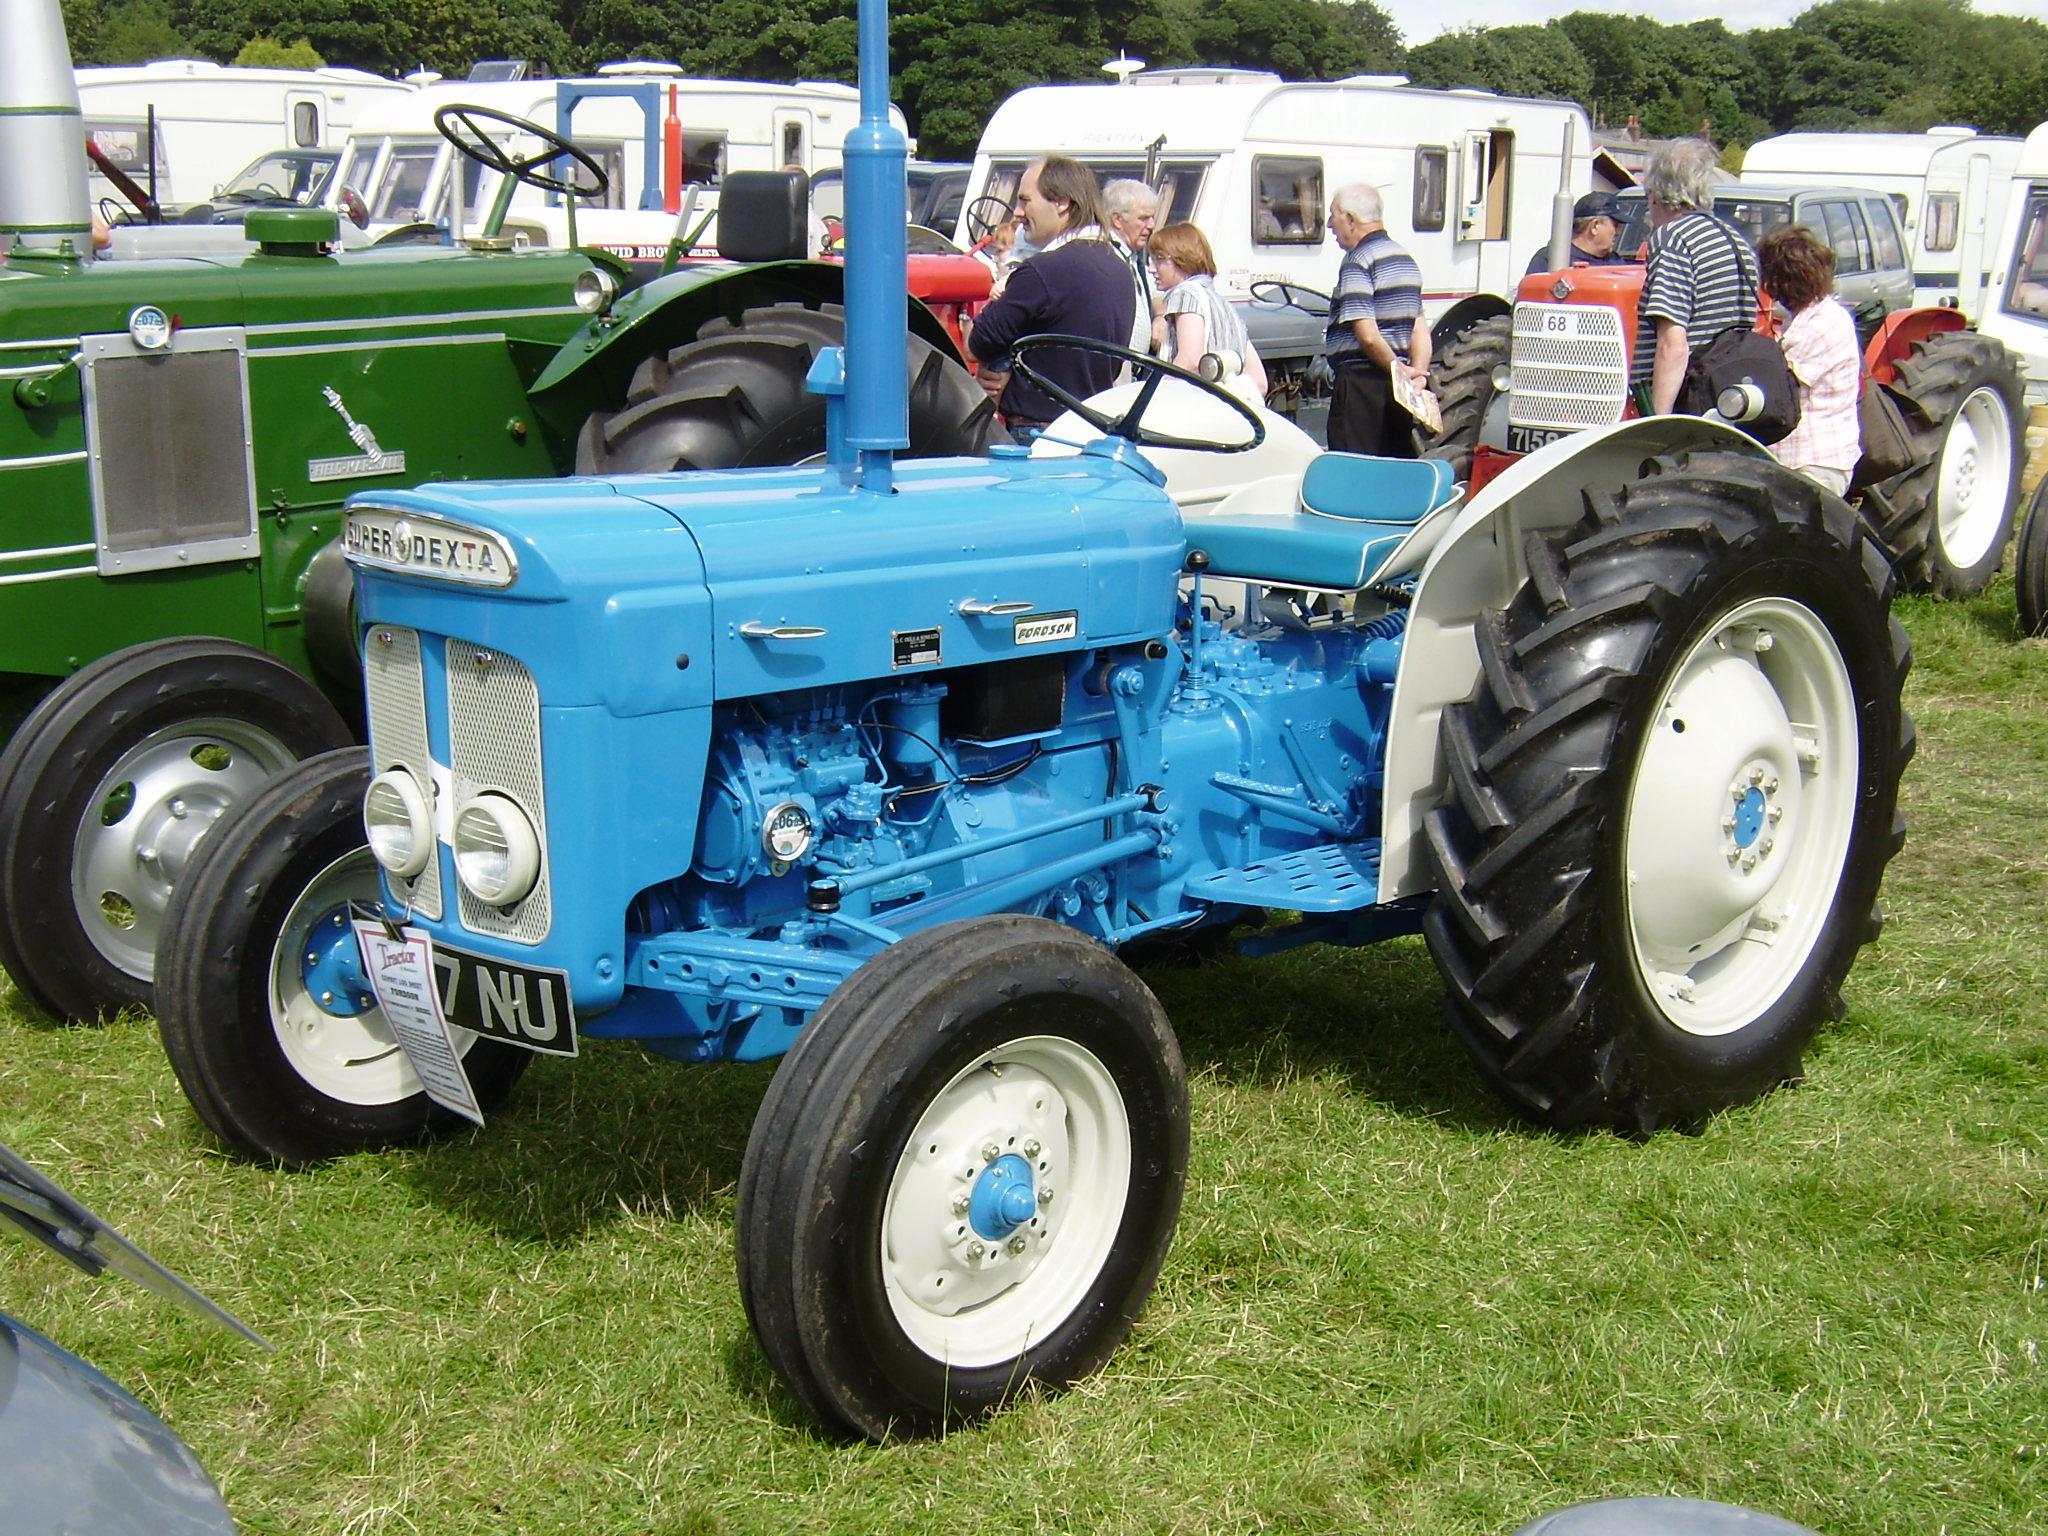 Ford 601 Workmaster Amp 8n Tractors Equipment 1953 941 Powermaster Wiring Diagram Fordson Super Dexta